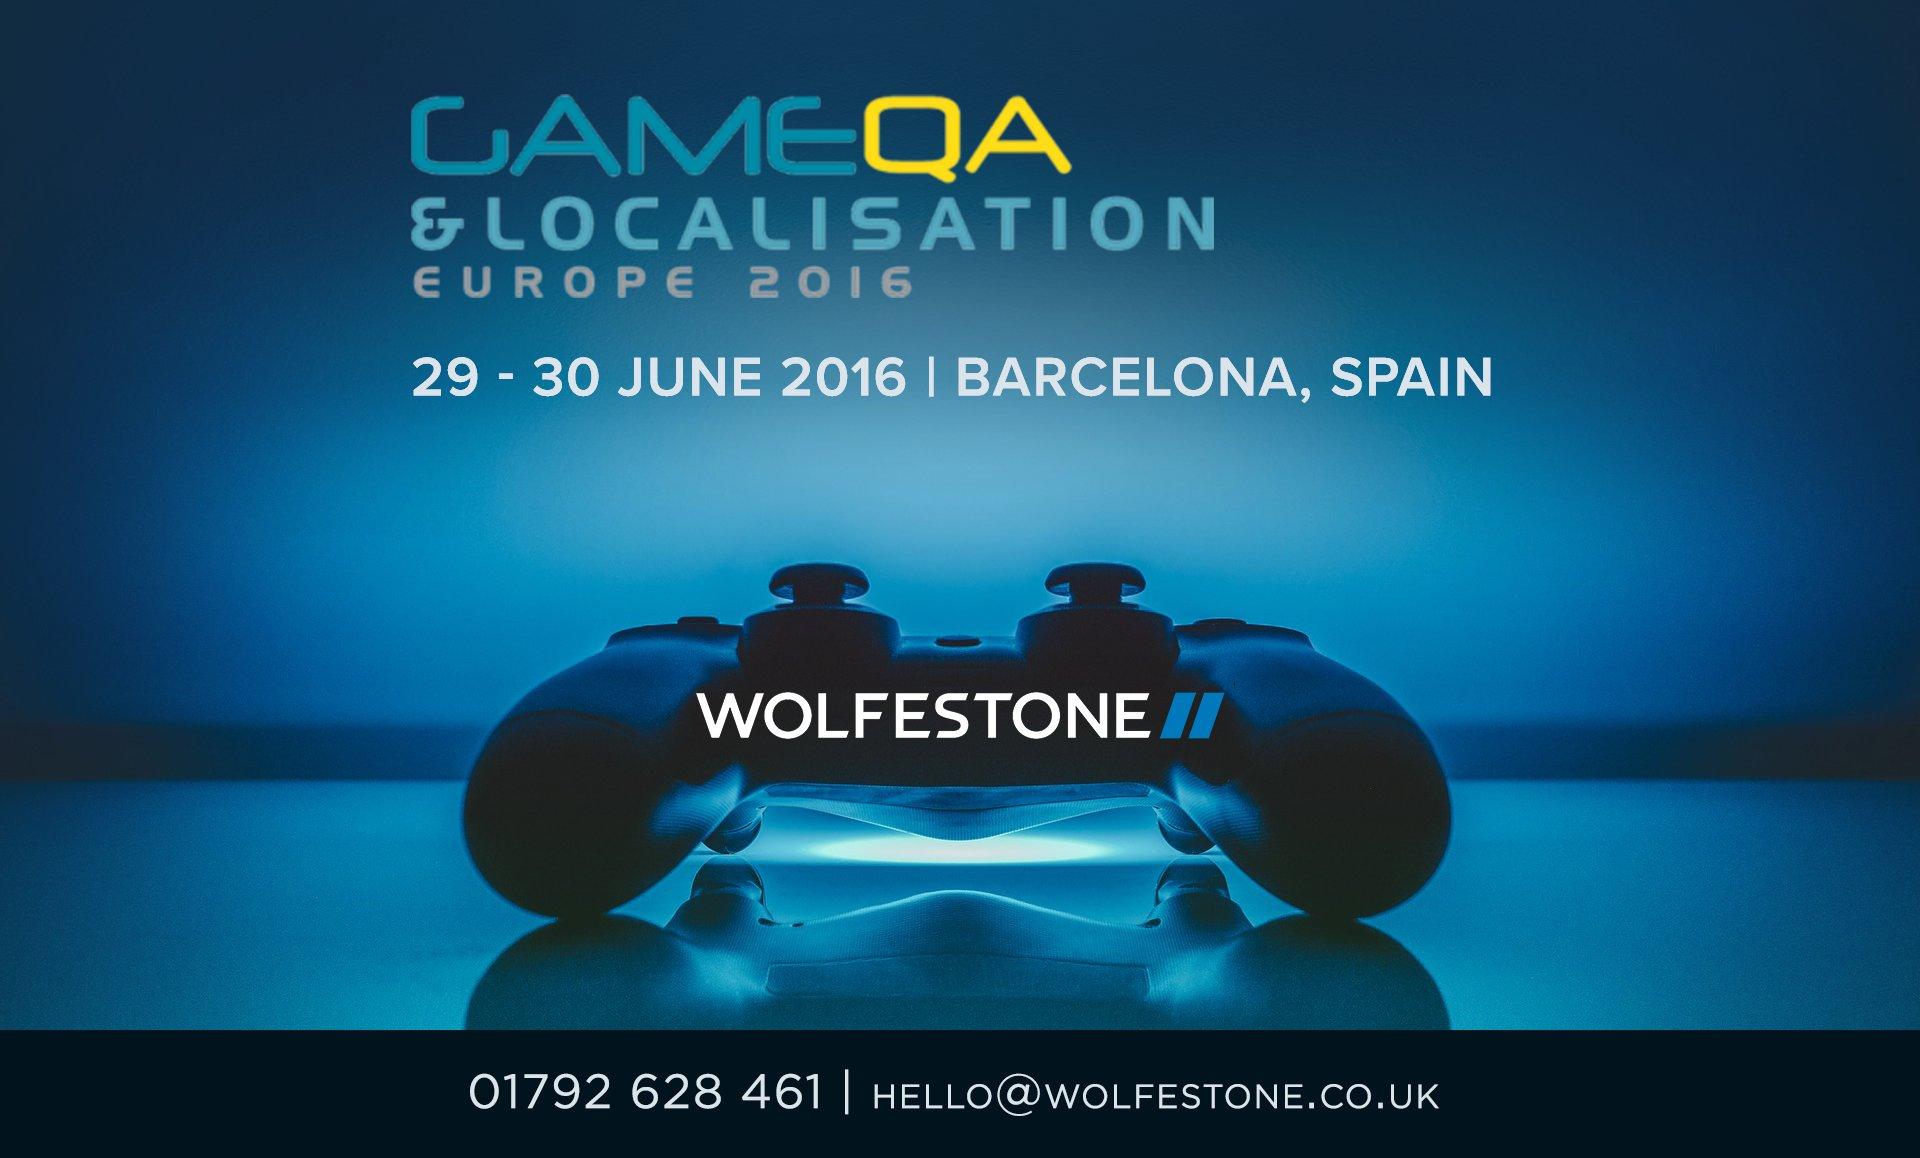 Meet Wolfestone at the Game QA & Localisation Forum in Barcelona 2016. 01792 628461. hello@wolfestone.co.uk